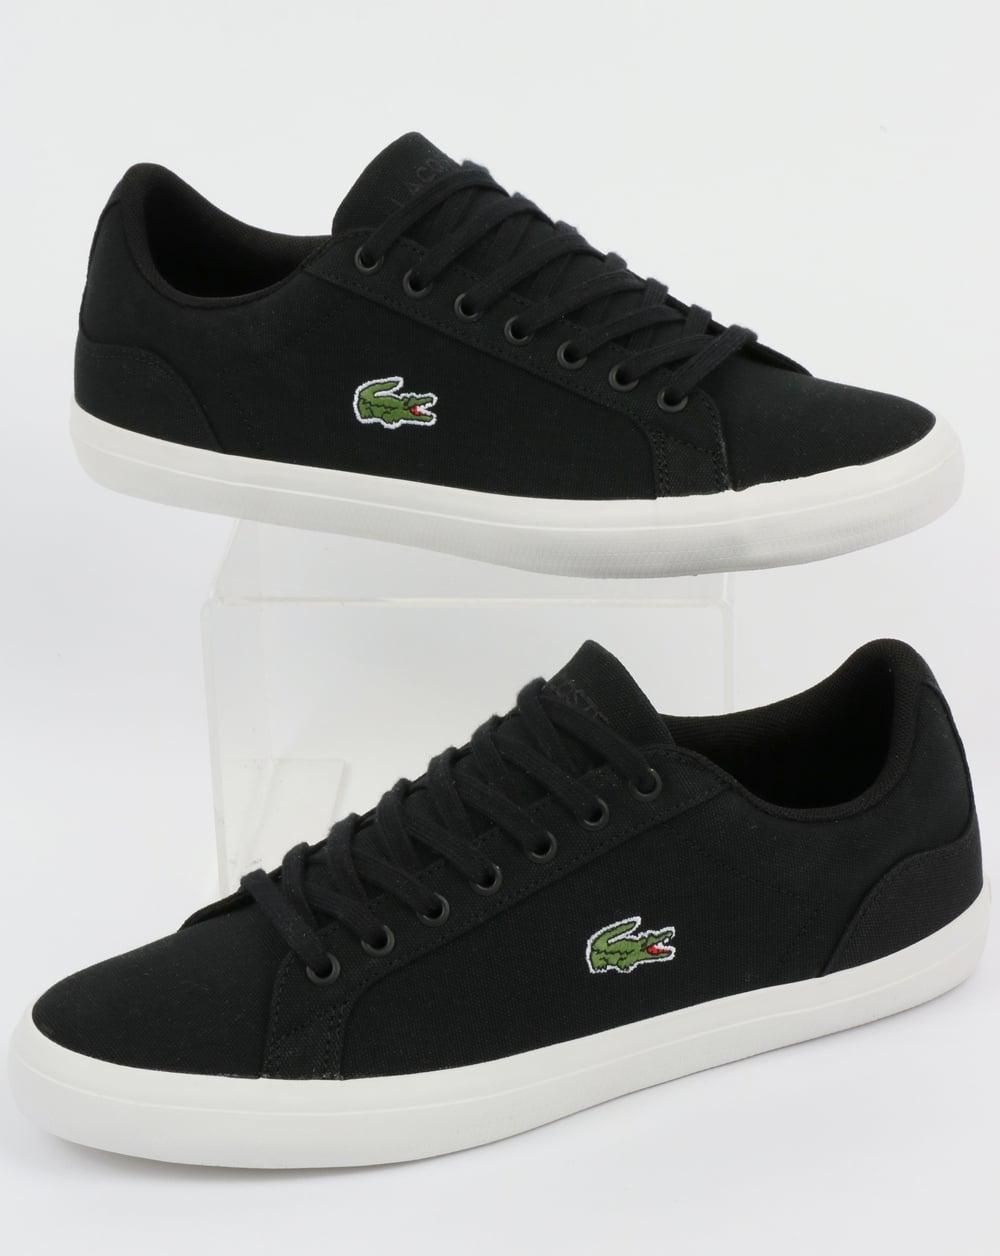 Lacoste Footwear Lerond Canvas Trainers